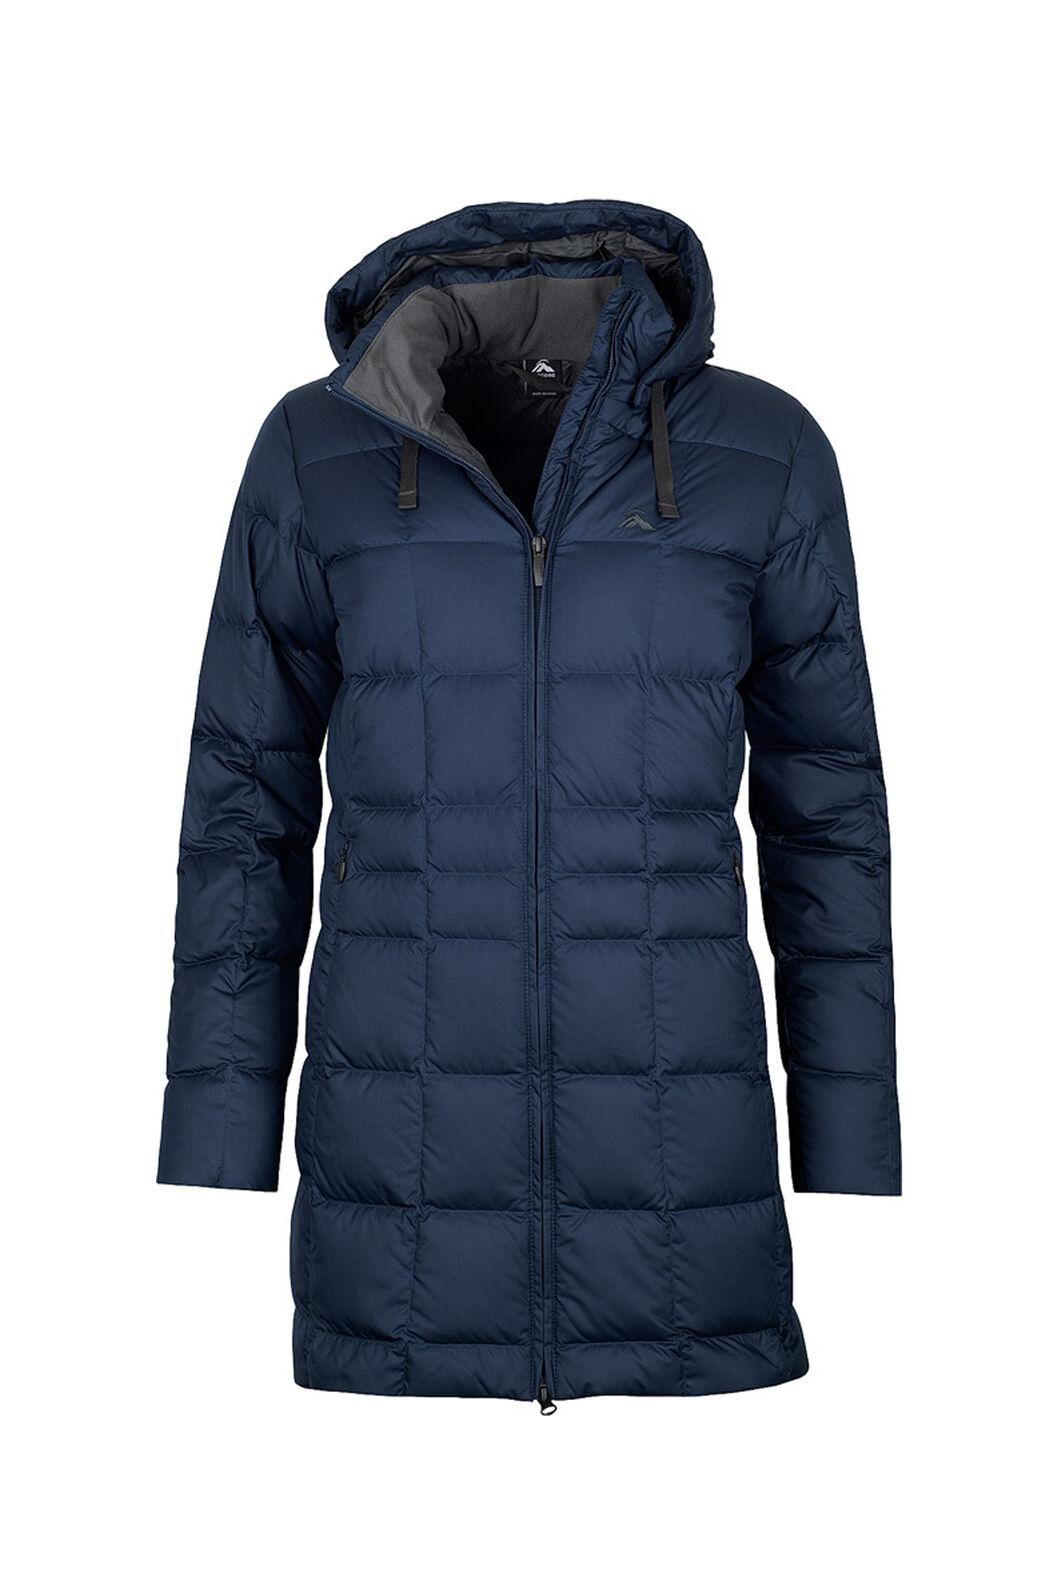 Macpac Aurora Down Coat V3 - Women's, Black Iris, hi-res